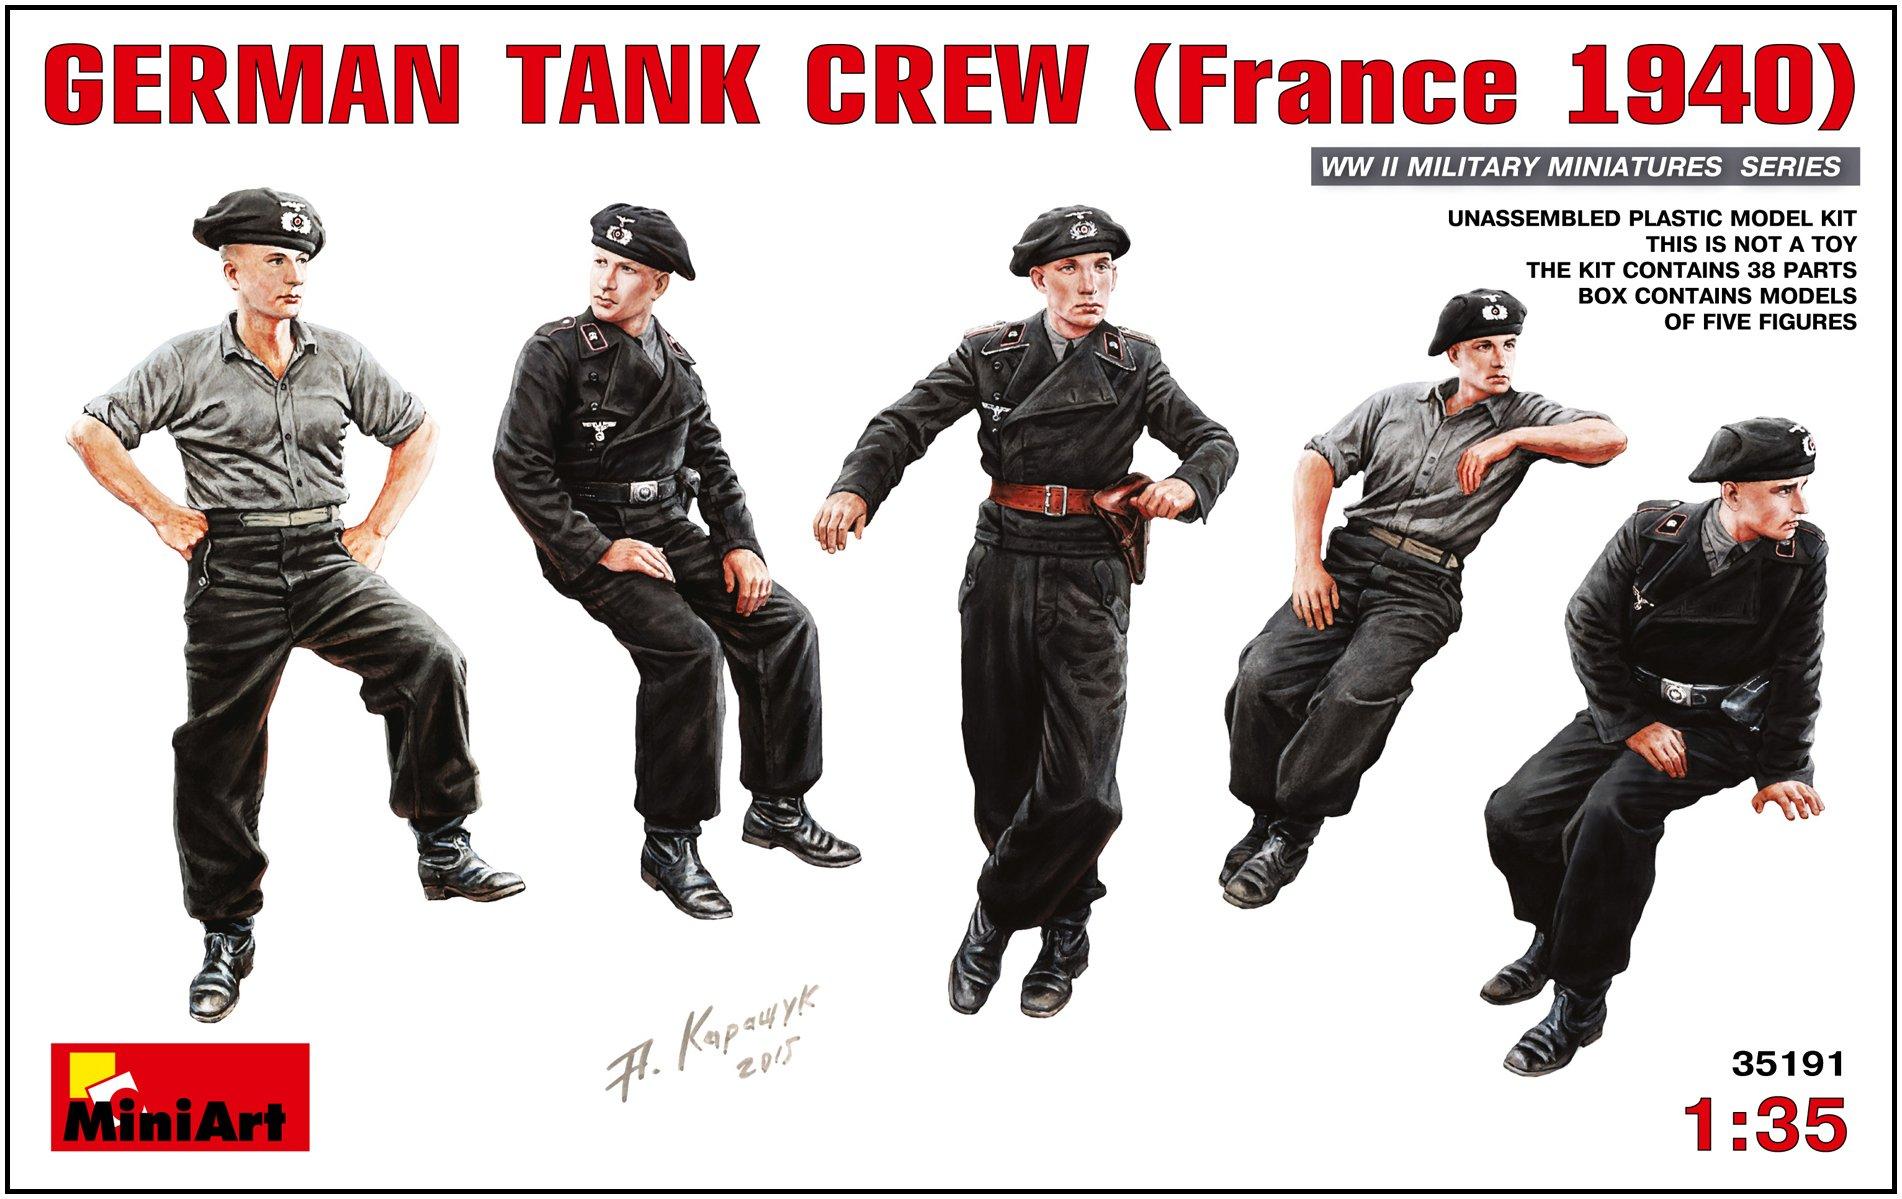 Miniart 1:35 - German Tankcrew (france 1940) by MiniArt (Image #1)